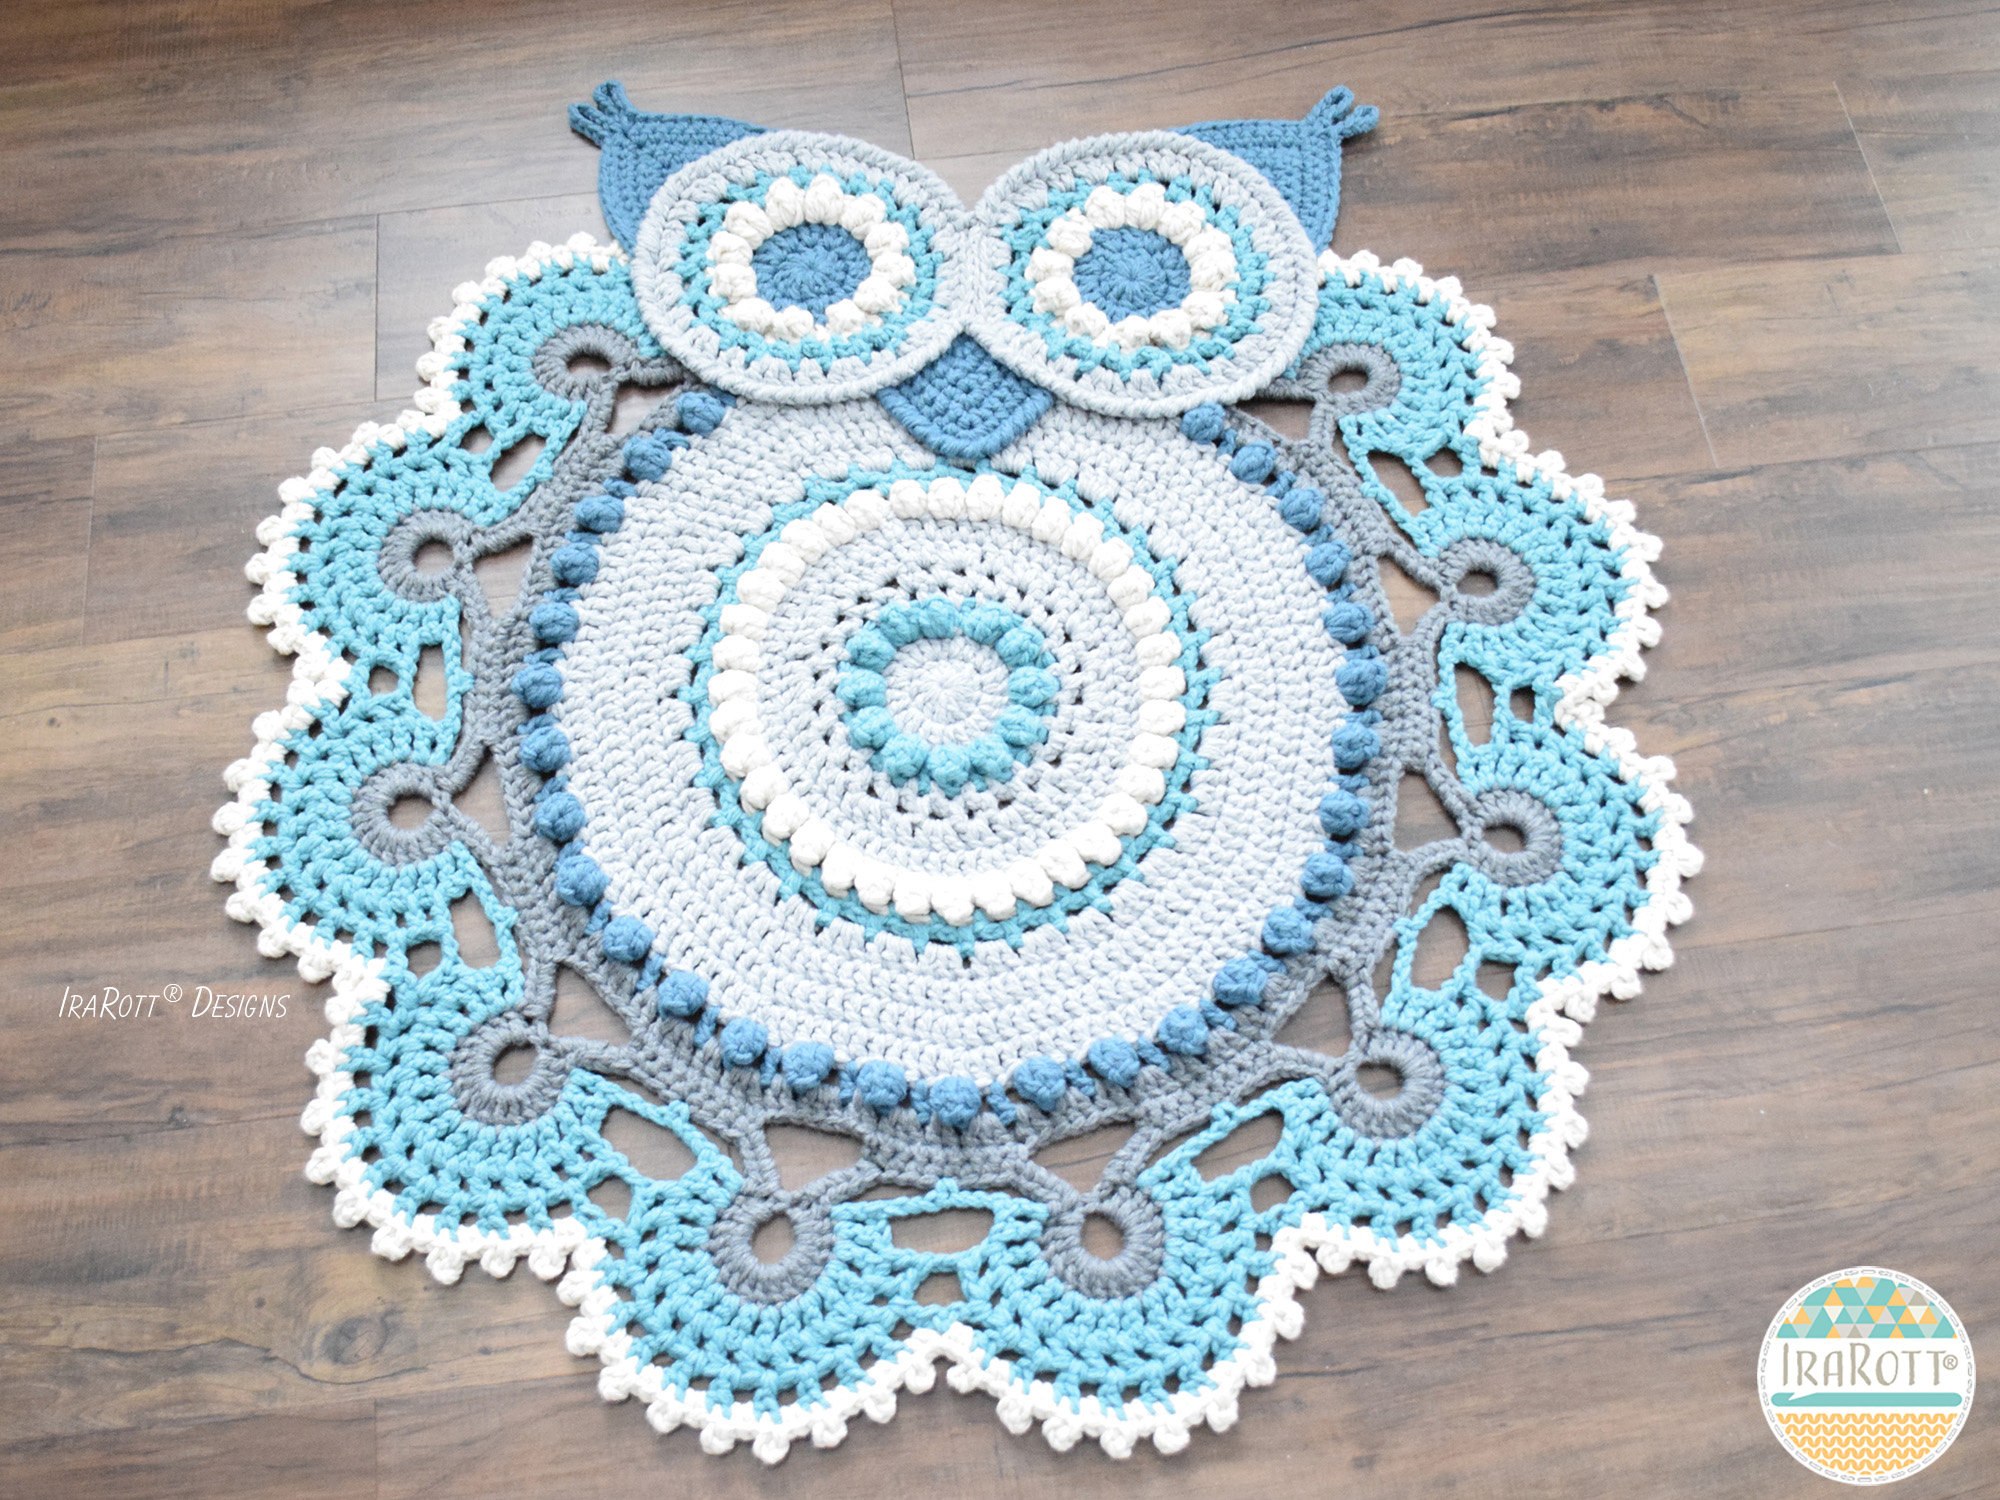 Crochet Afghan Rugs Pattern Free : Retro Owl Rug or Doily Rug PDF Crochet Pattern - IraRott Inc.